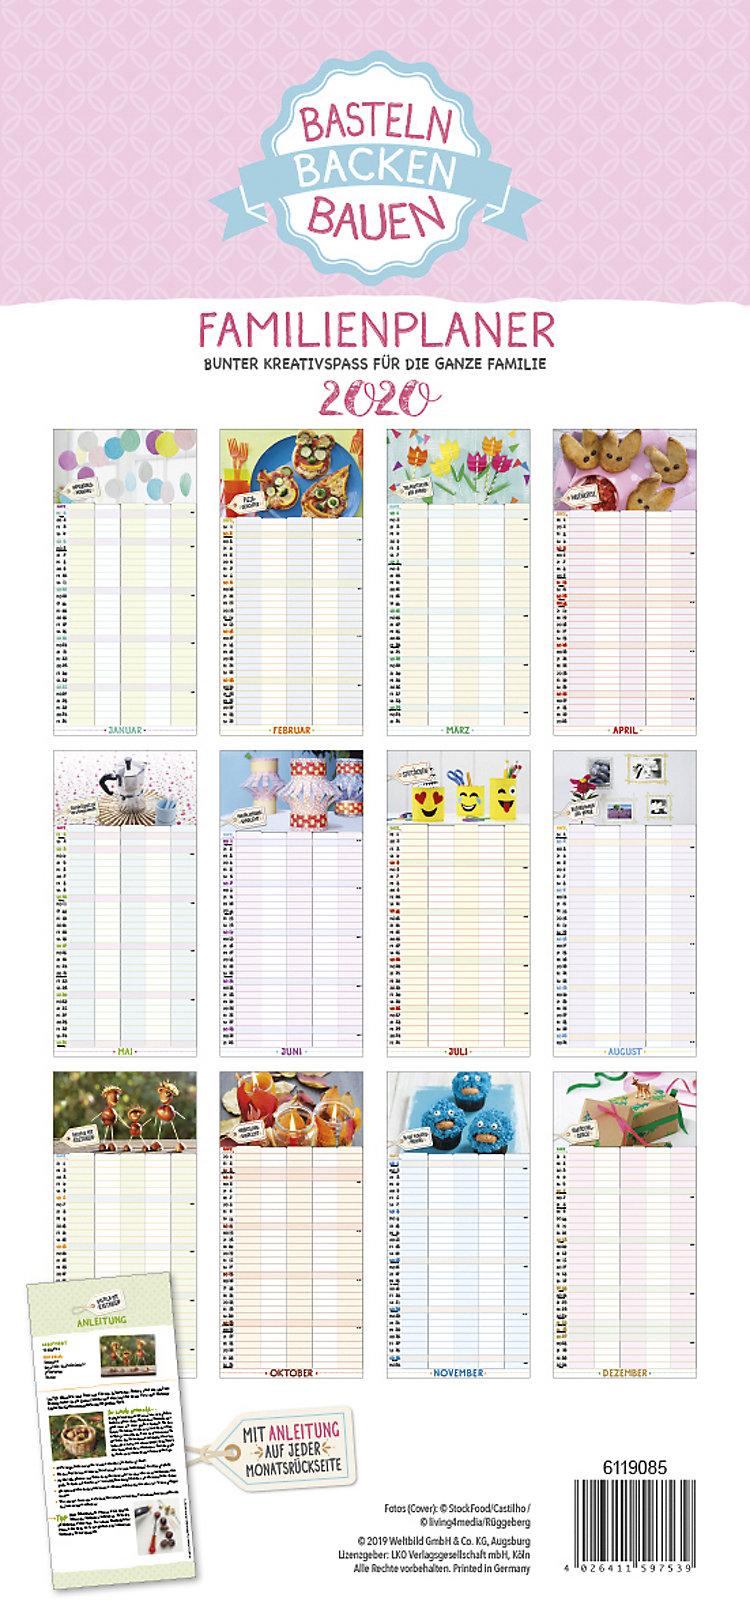 Backenbastelnbauen Familienplaner 2020 Kalender Bestellen